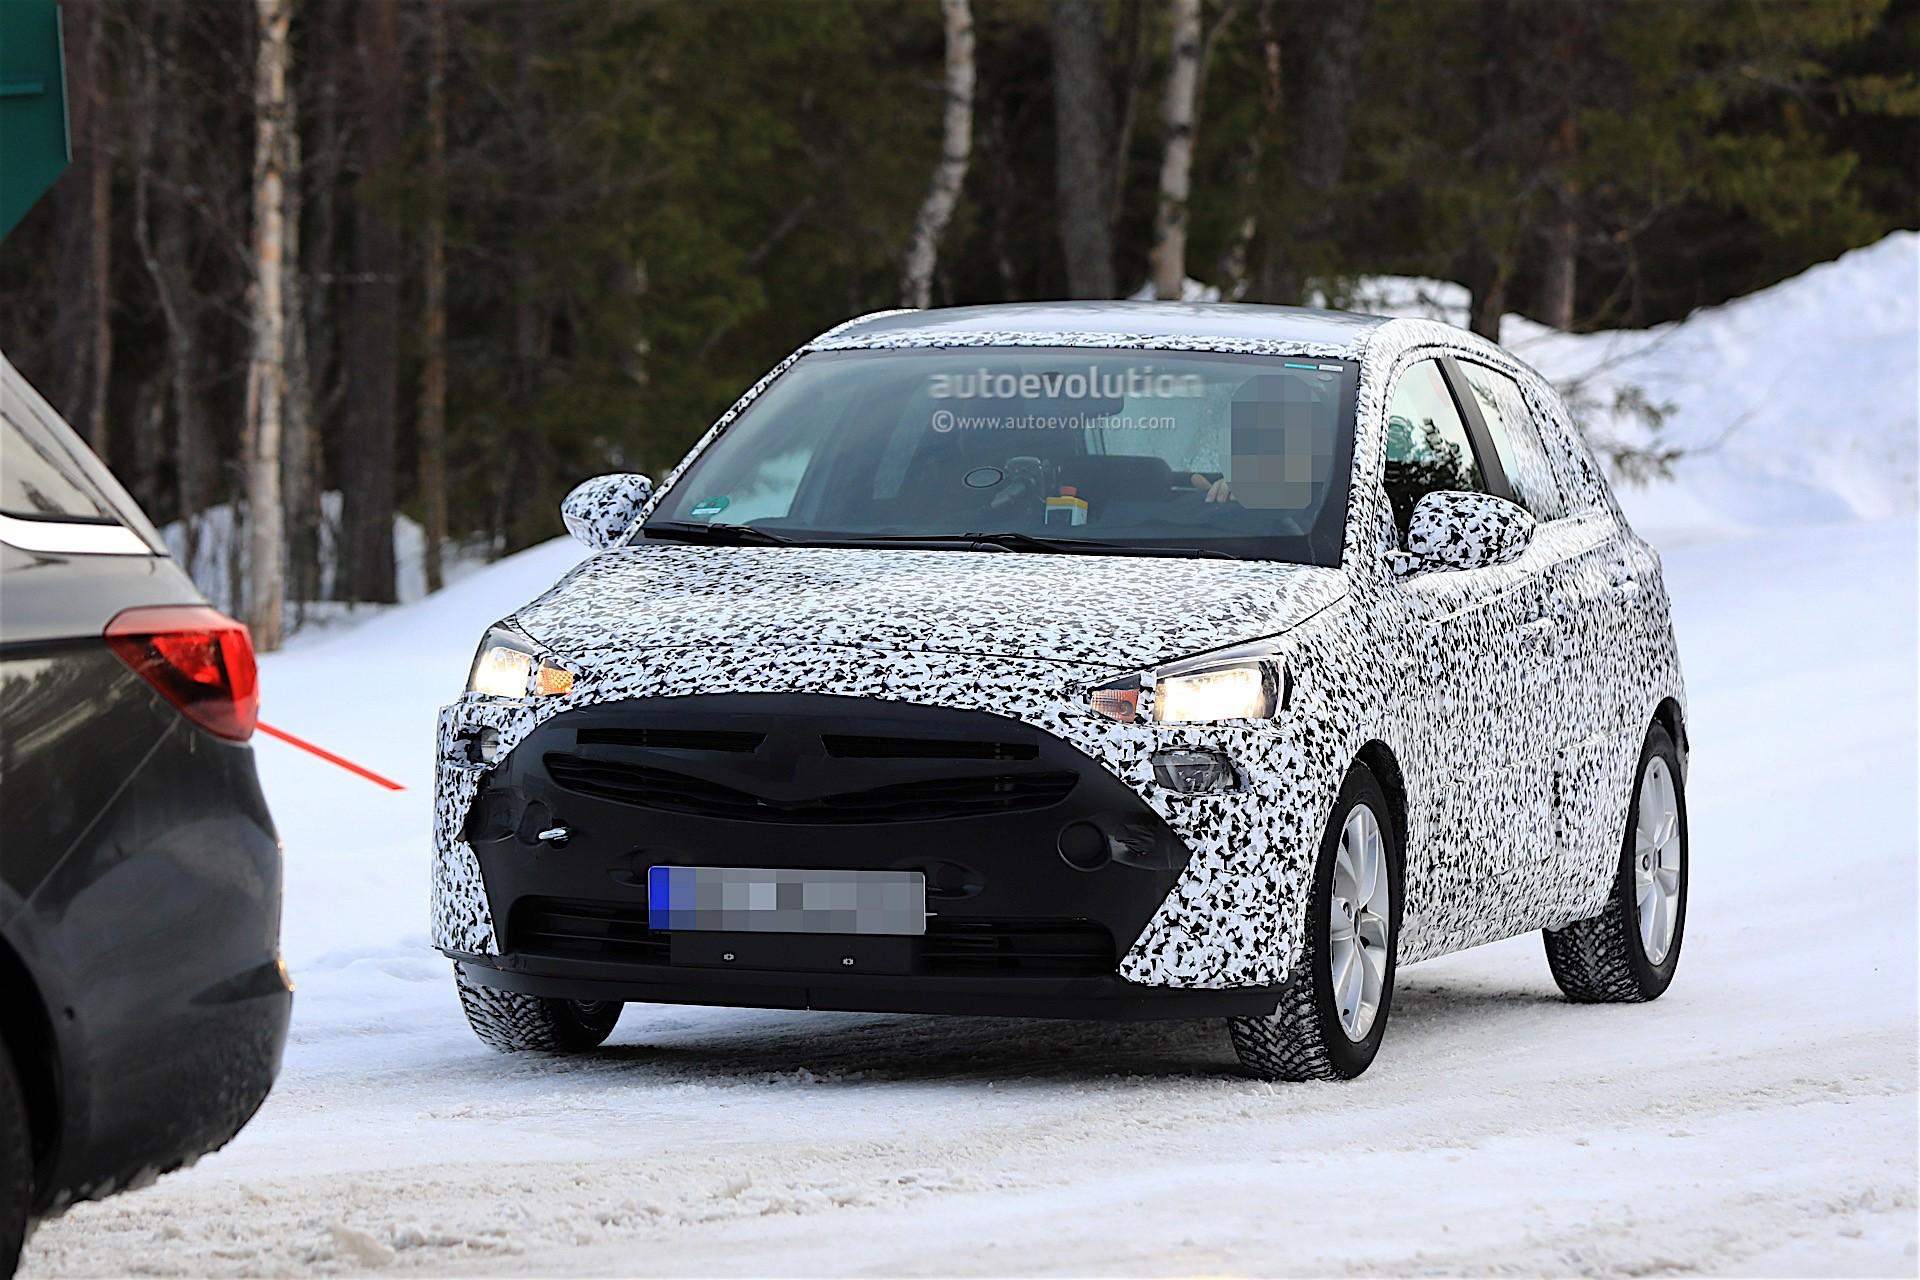 2019 Opel Corsa F Will Use Peugeot Engines Autoevolution